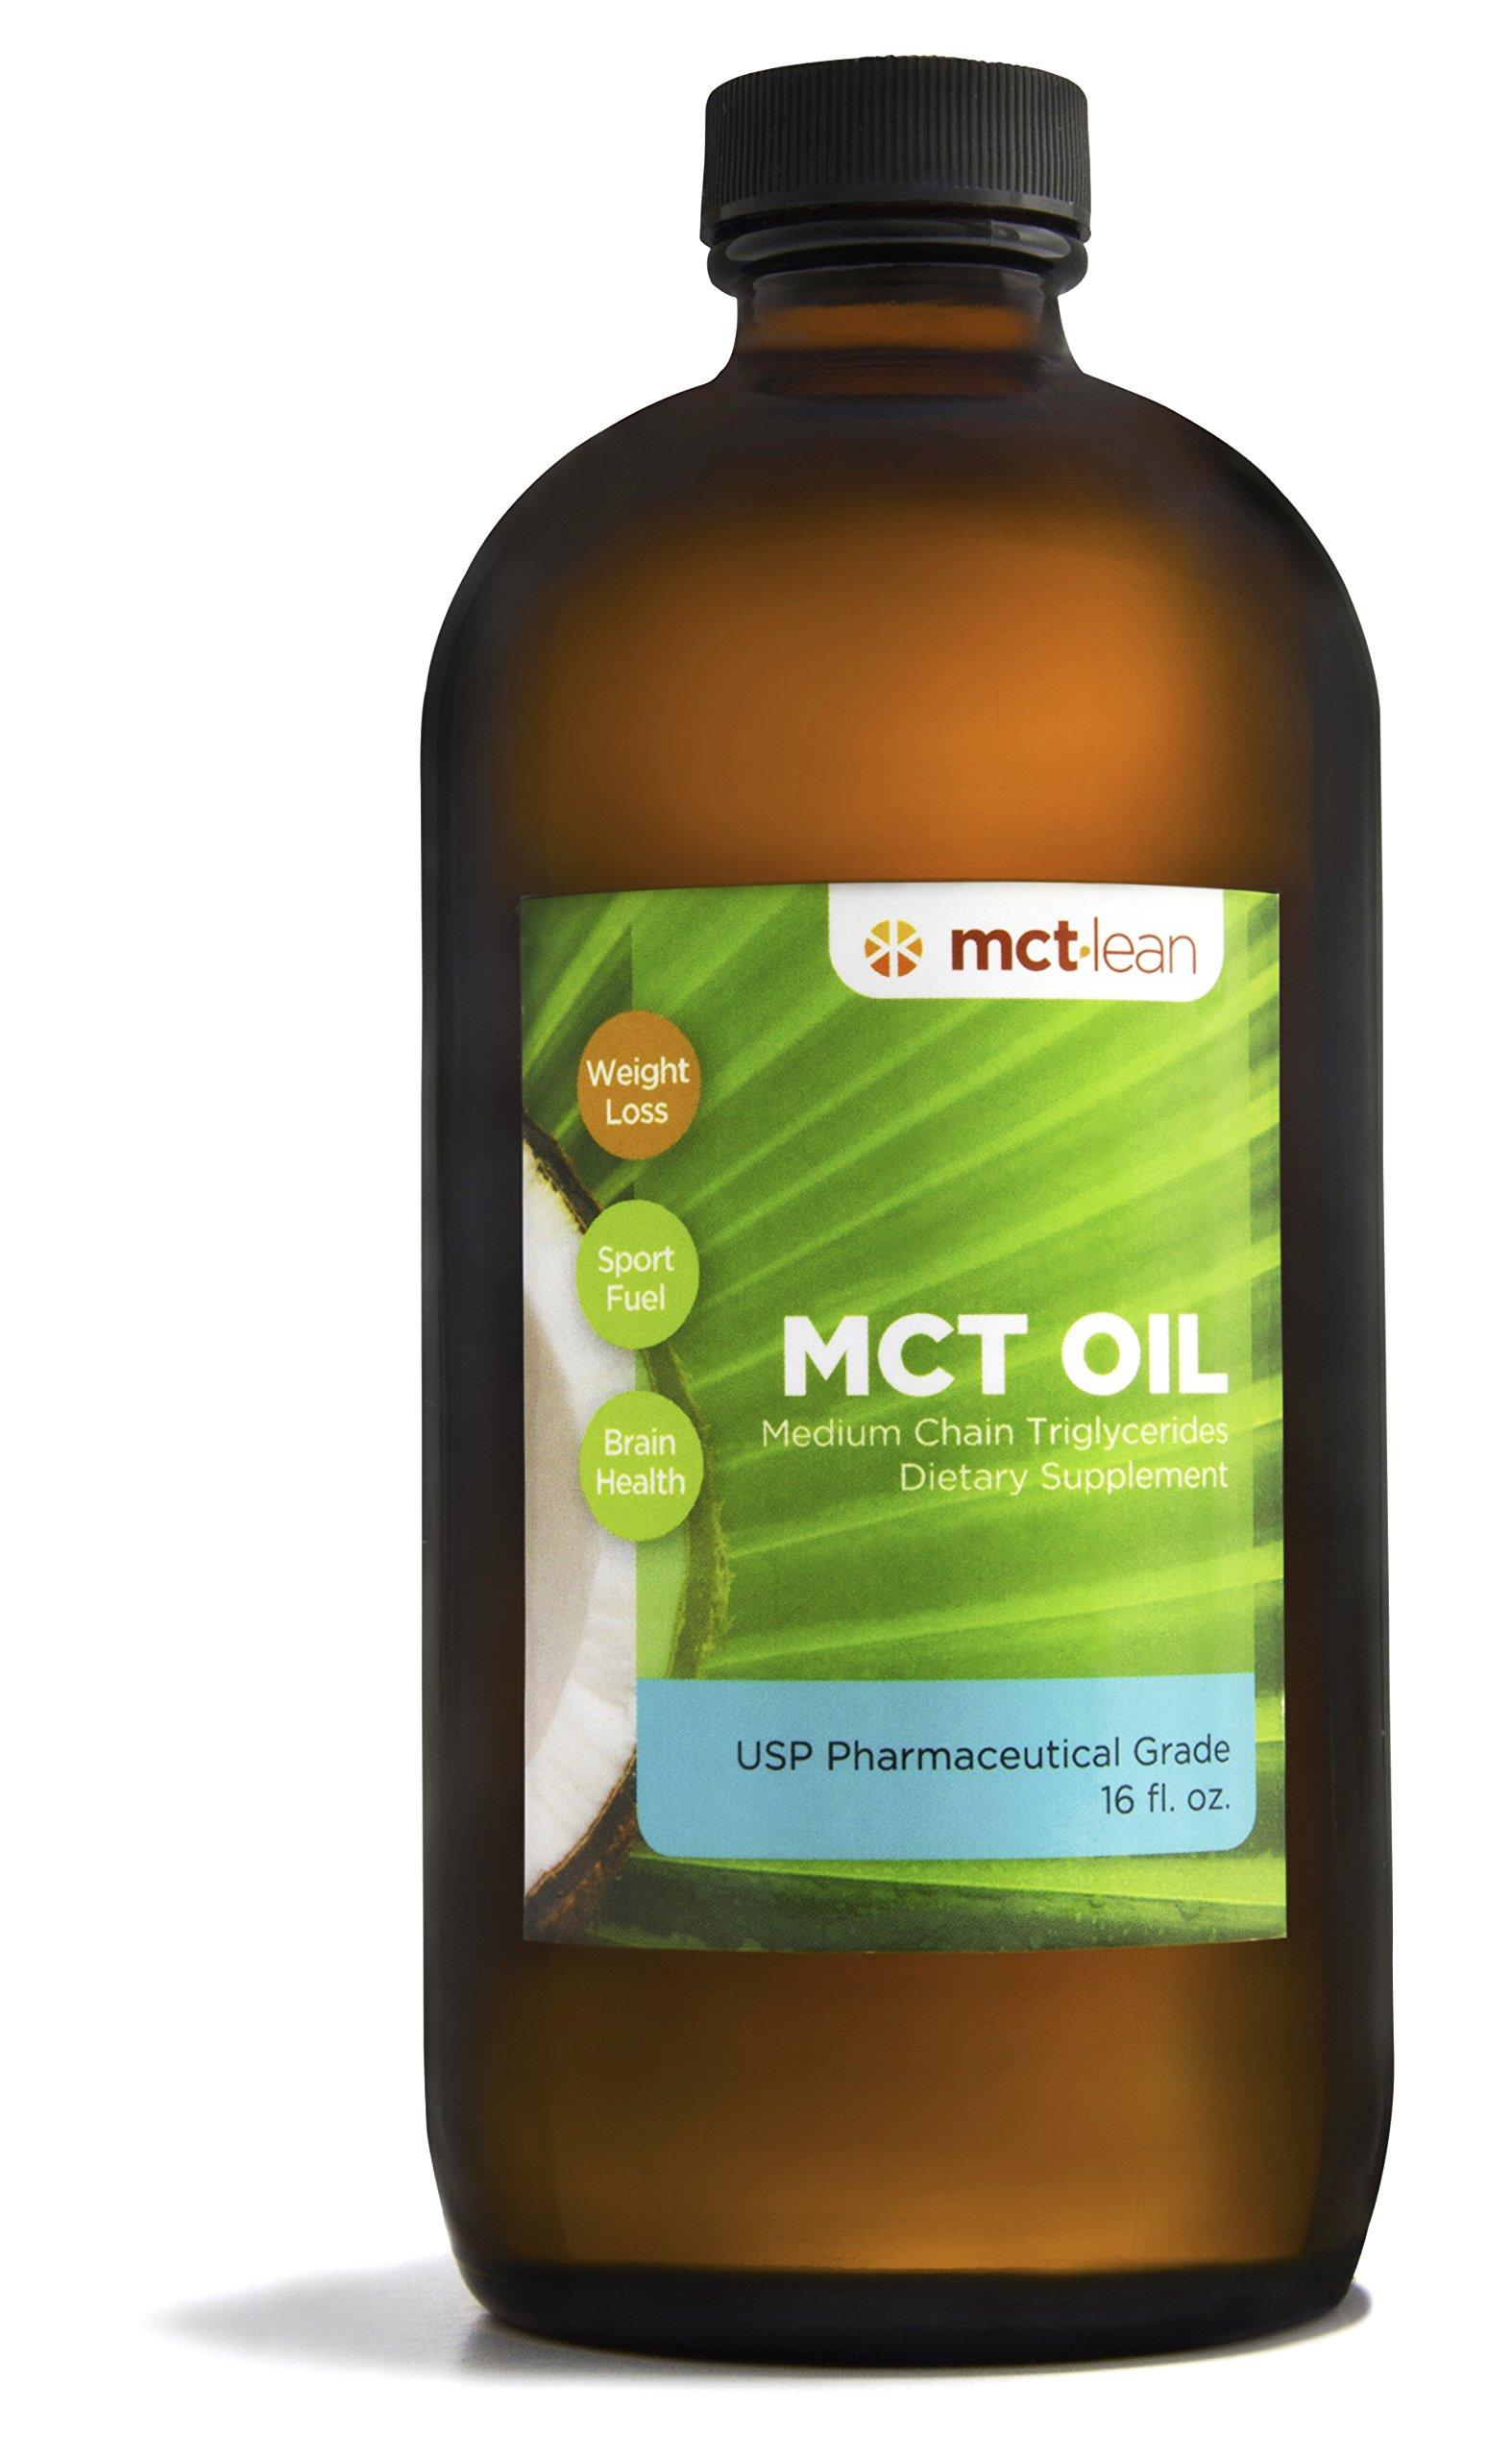 MCT Lean MCT Oil, 16 Oz. - 100% USP Verified (Pharmaceutical Grade), Certified Kosher